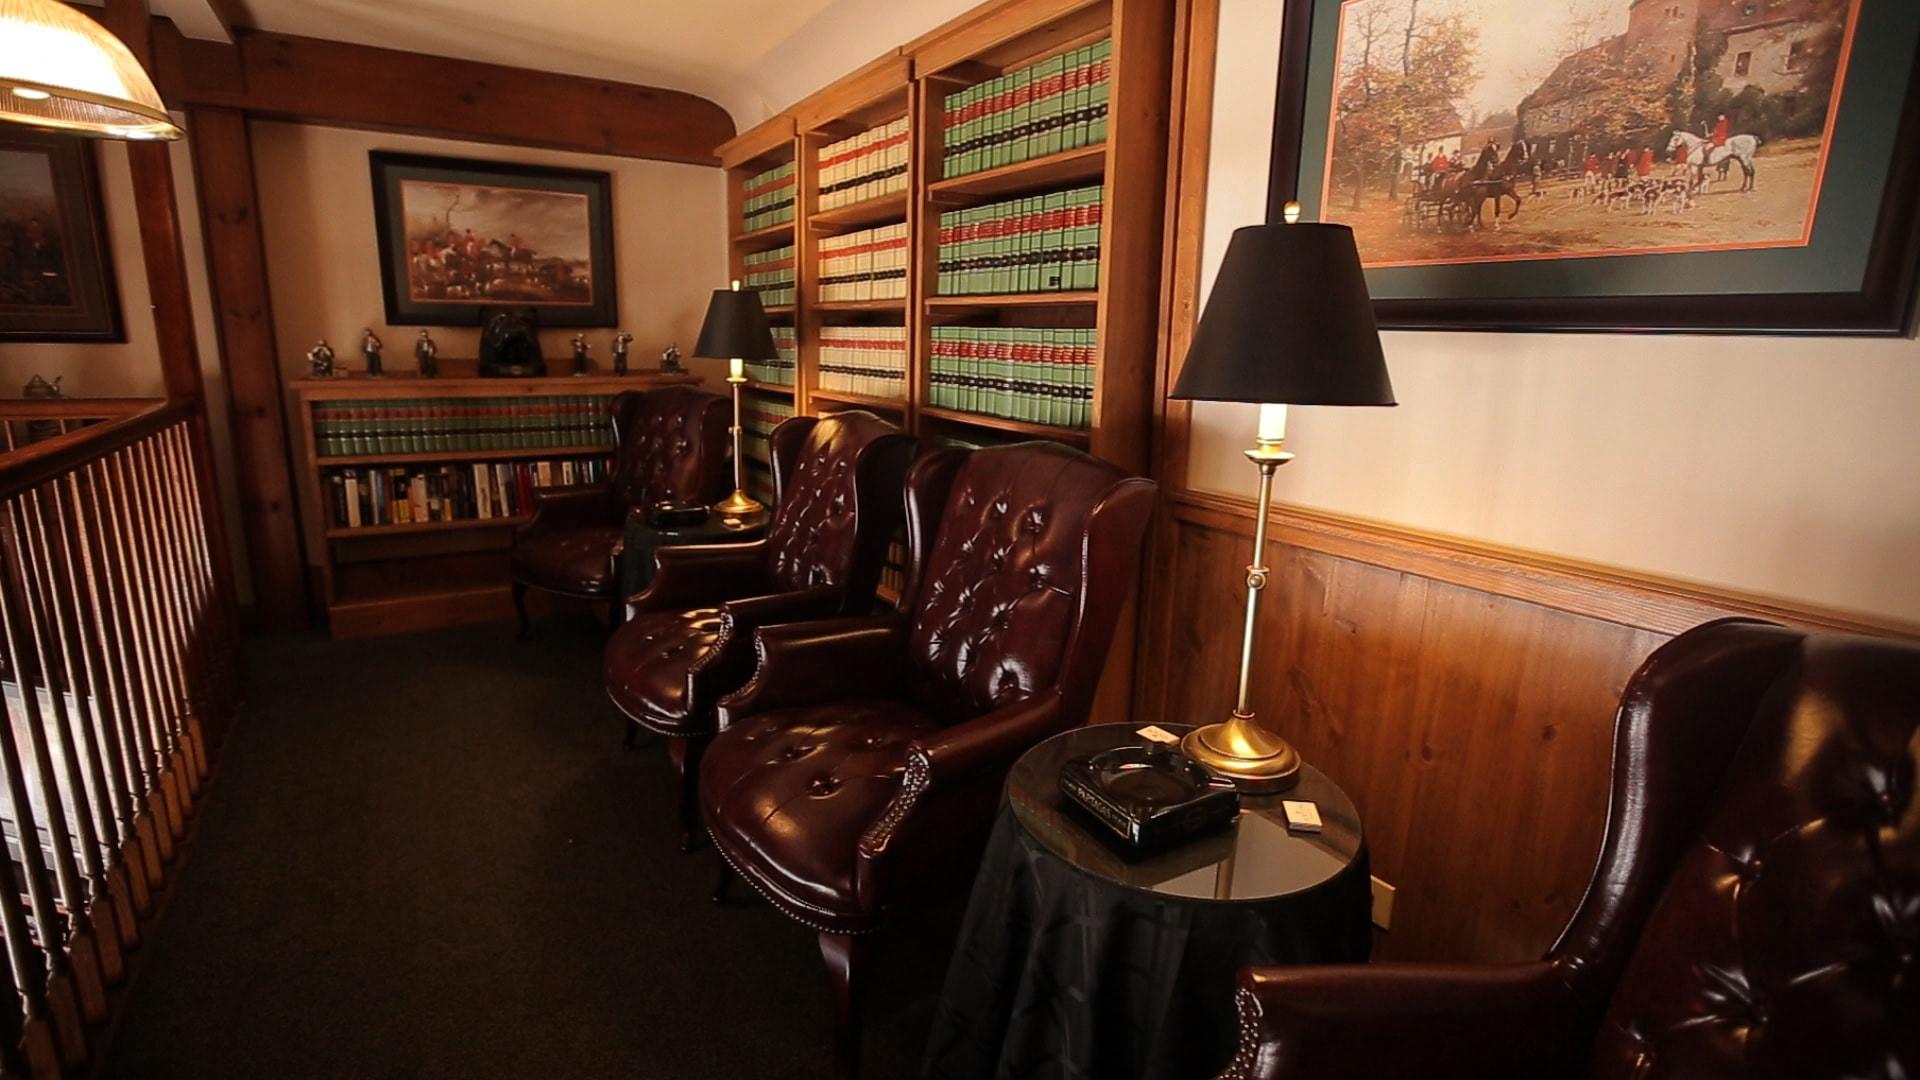 Cigar Lounge in The Tobacco Shop of Ridgewood-min.jpg